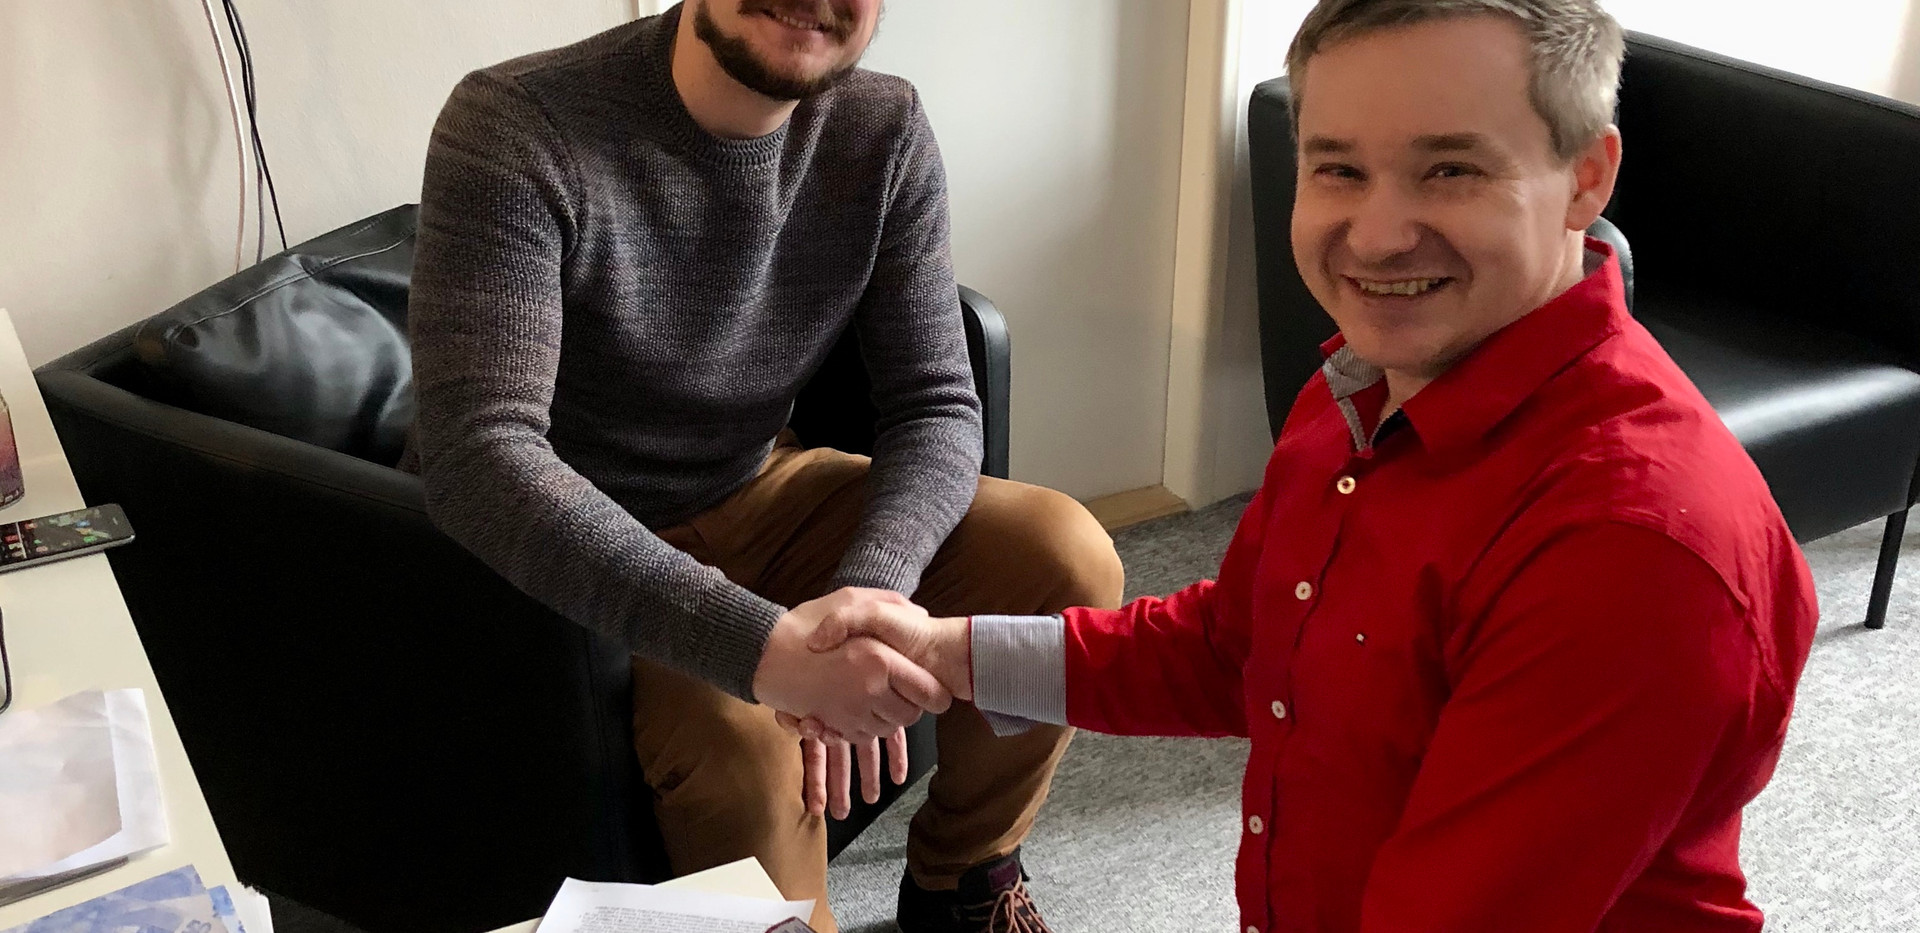 Vidasov podepsal exkluzivní smlouvu  s Nemoros